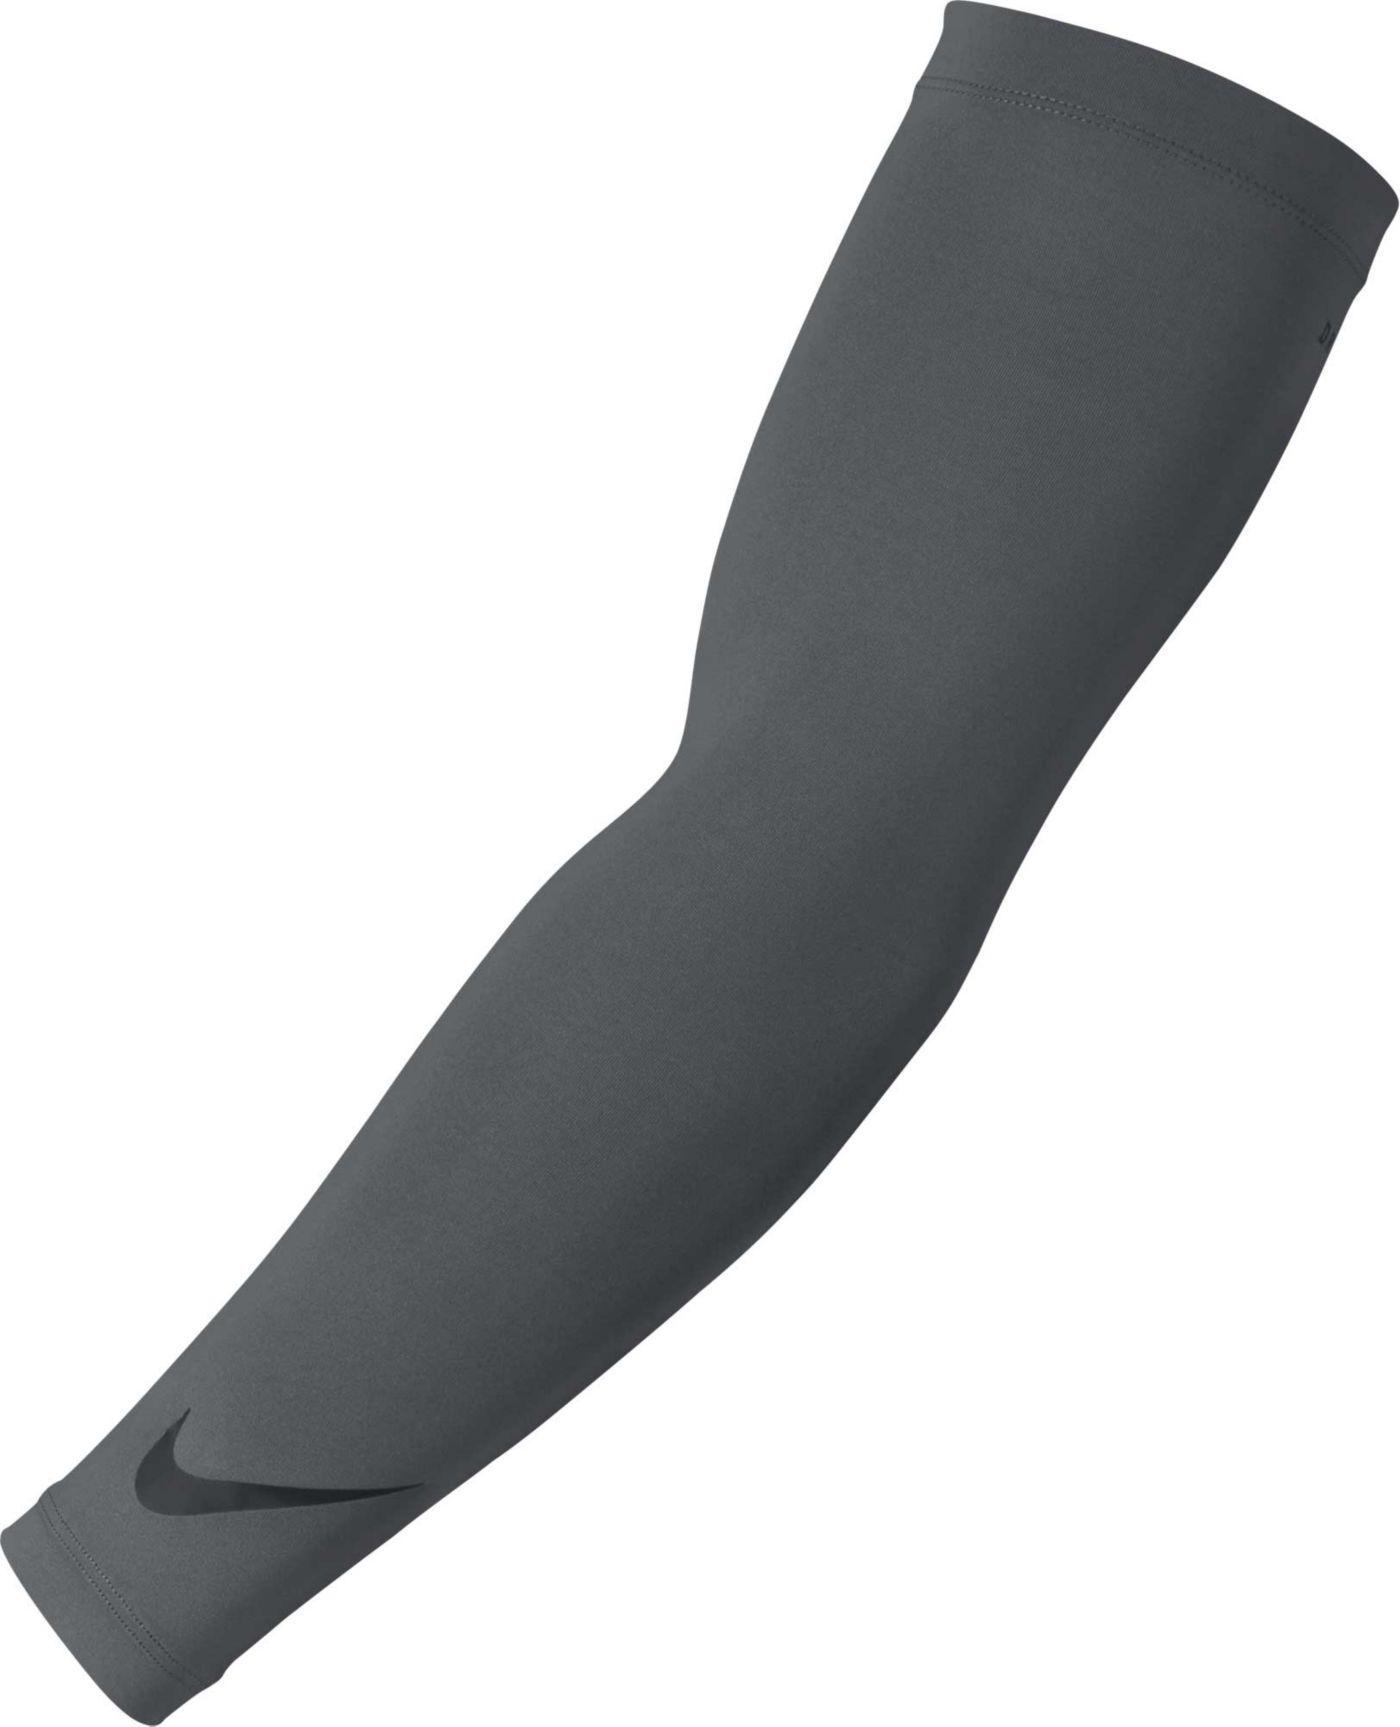 Nike Dri-FIT Solar Arm Sleeves